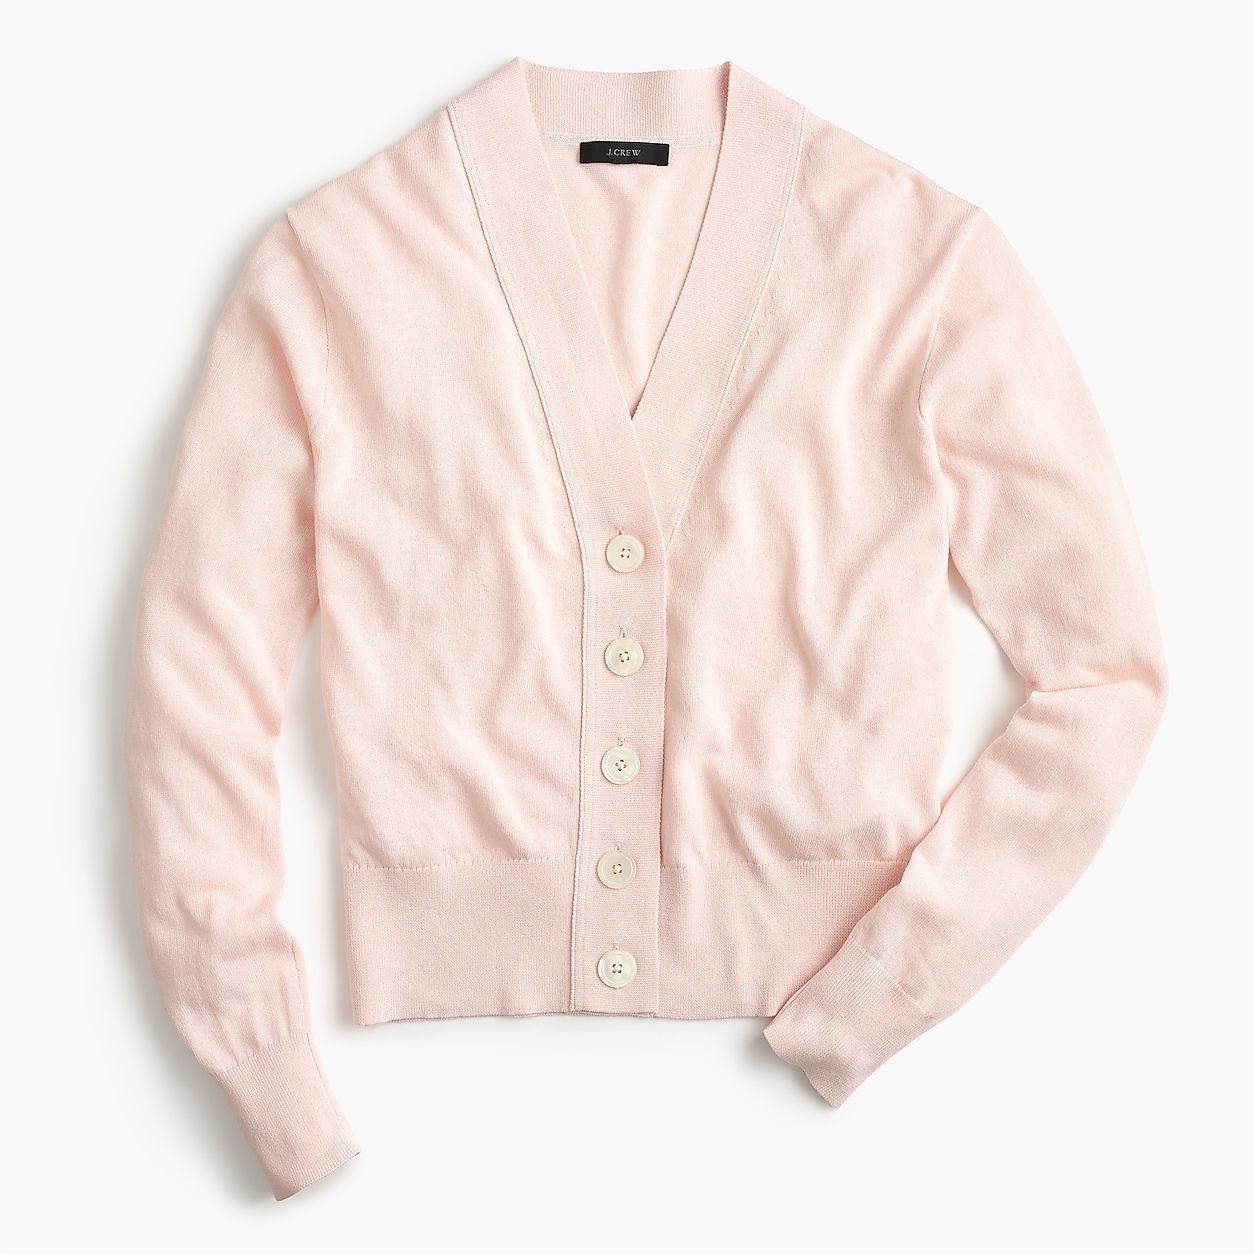 5bbfb25568e Cropped Lightweight Cardigan Sweater